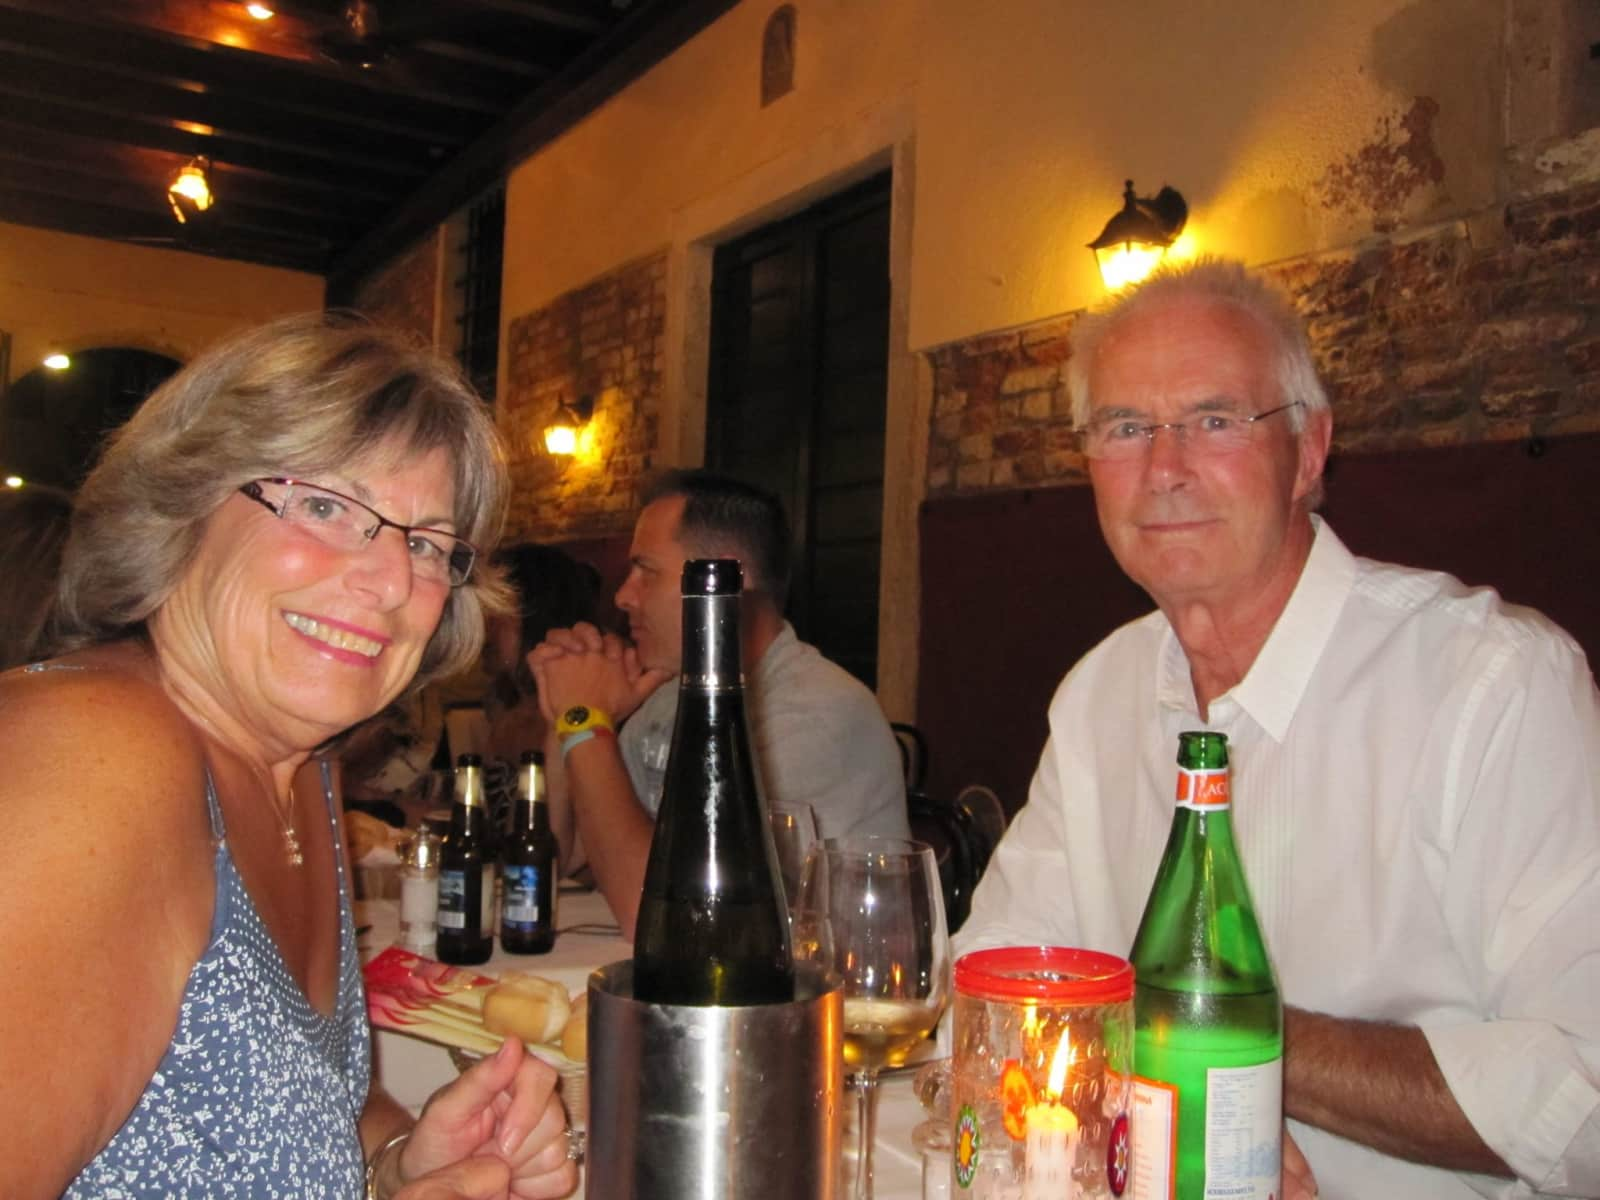 Robert & Margaret from Calgary, Alberta, Canada